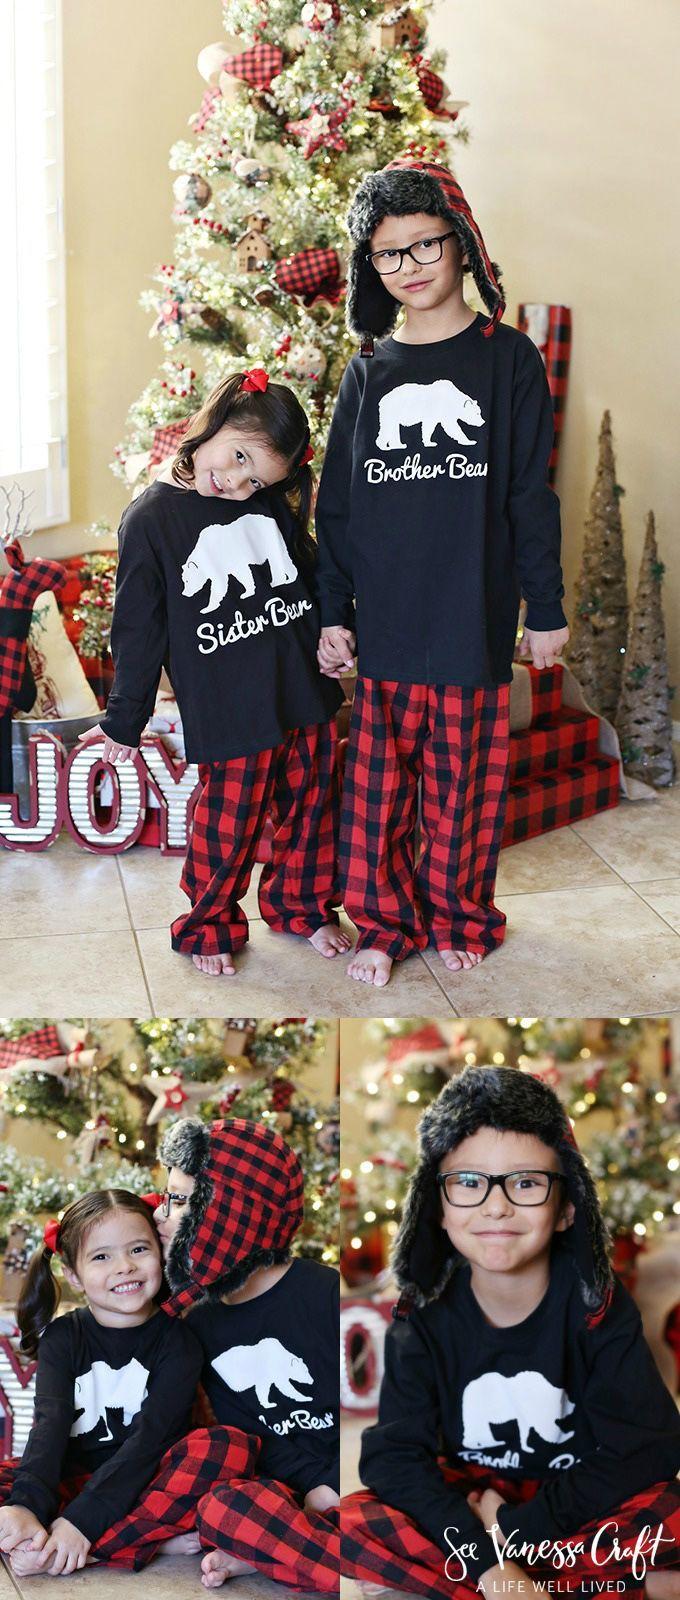 d8766d4e2d Family Christmas Pajamas - brother bear and sister bear jammies